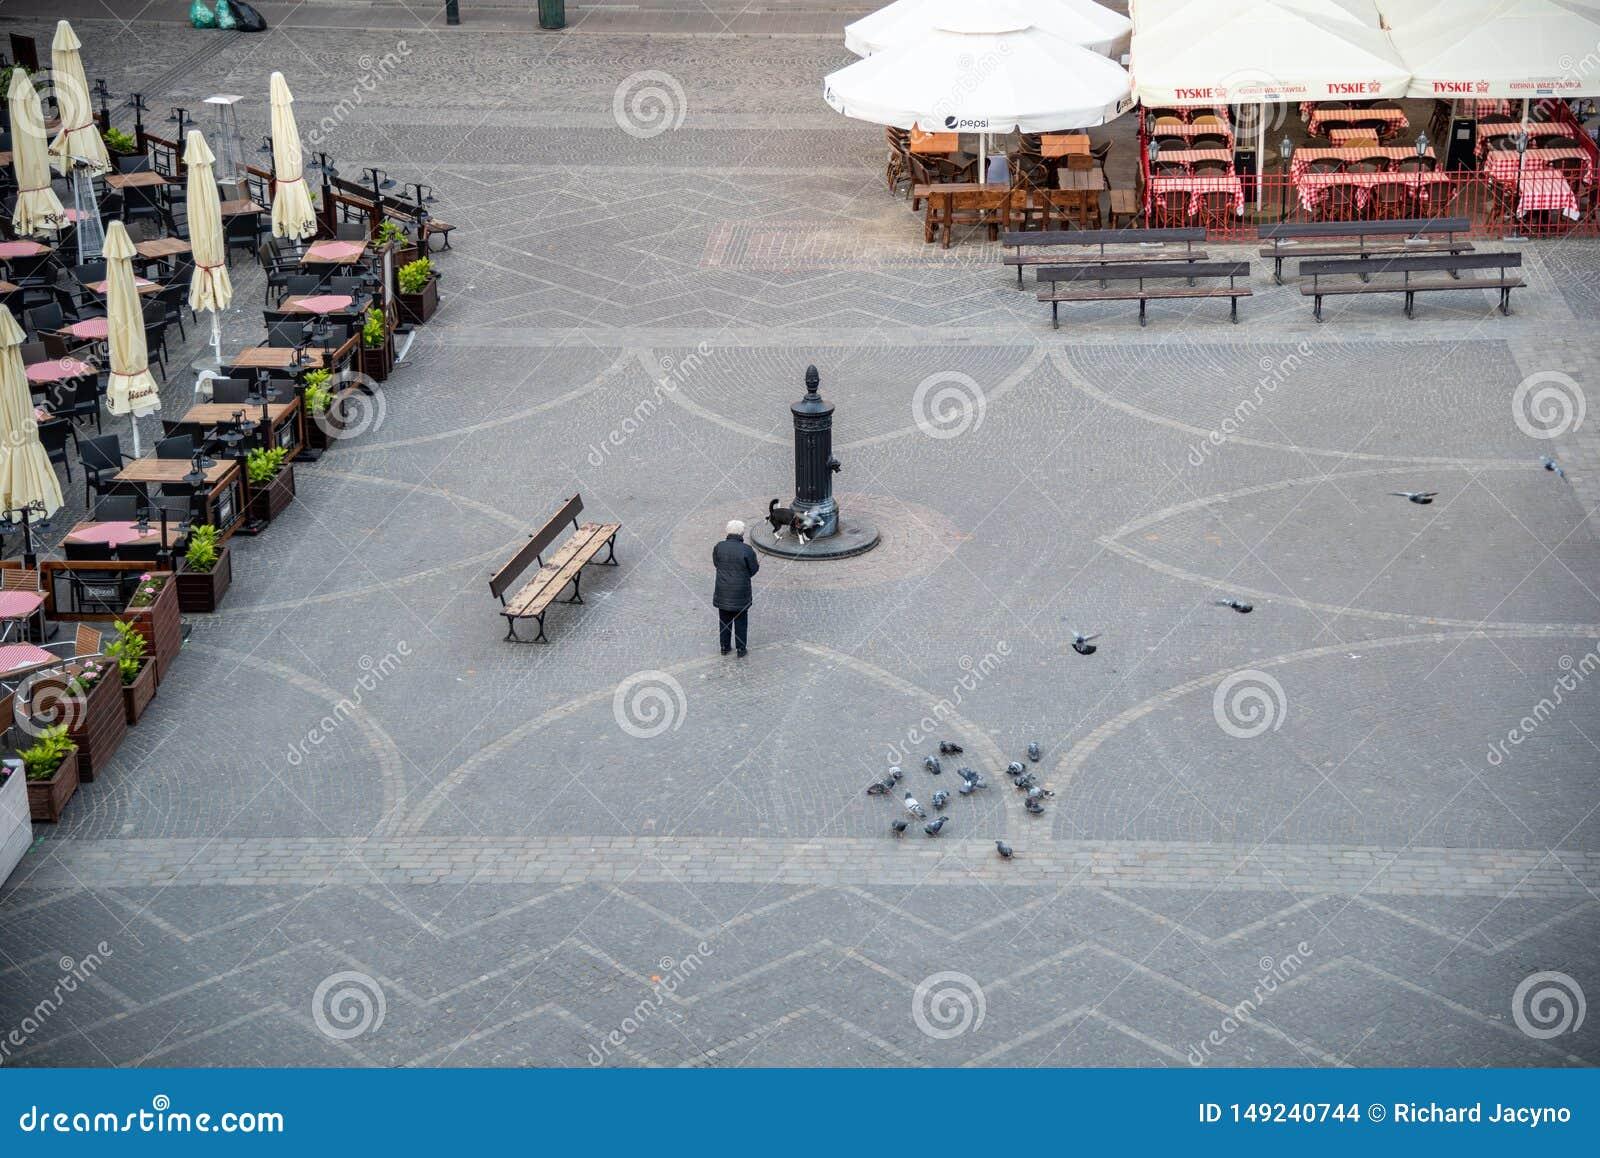 Le vieux regard fixe Miasto de la ville de Varsovie est le centre historique de Varsovie